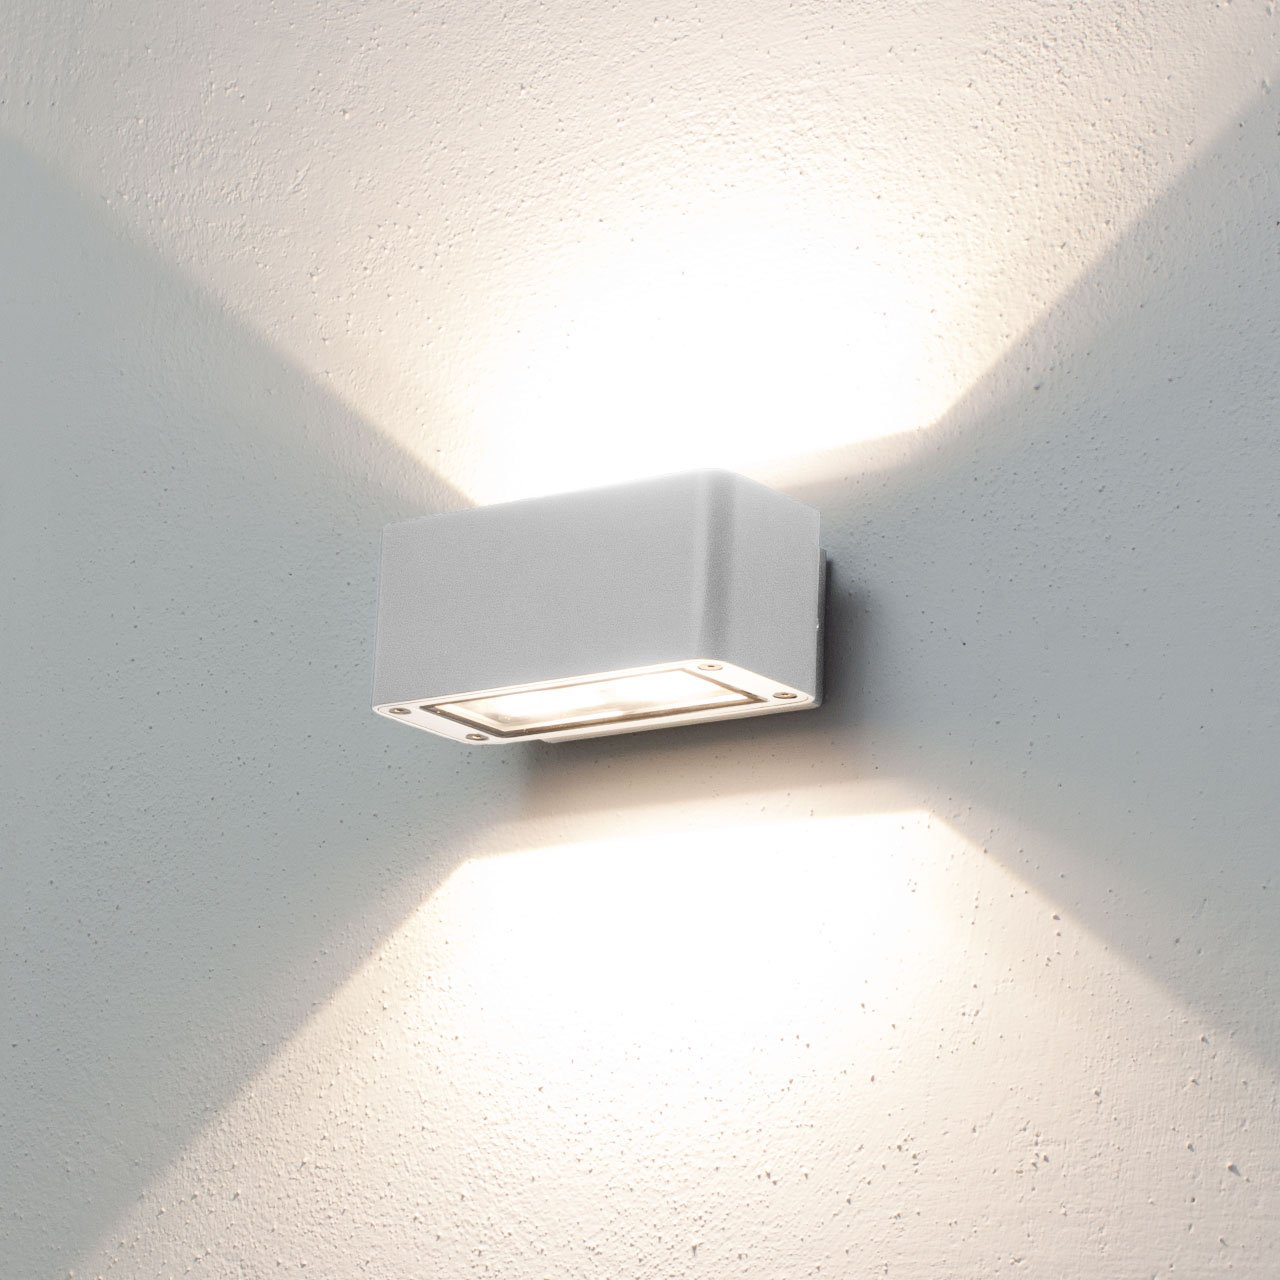 Lampada da parete, applique LED bianco caldo, 12W, colore bianco ...